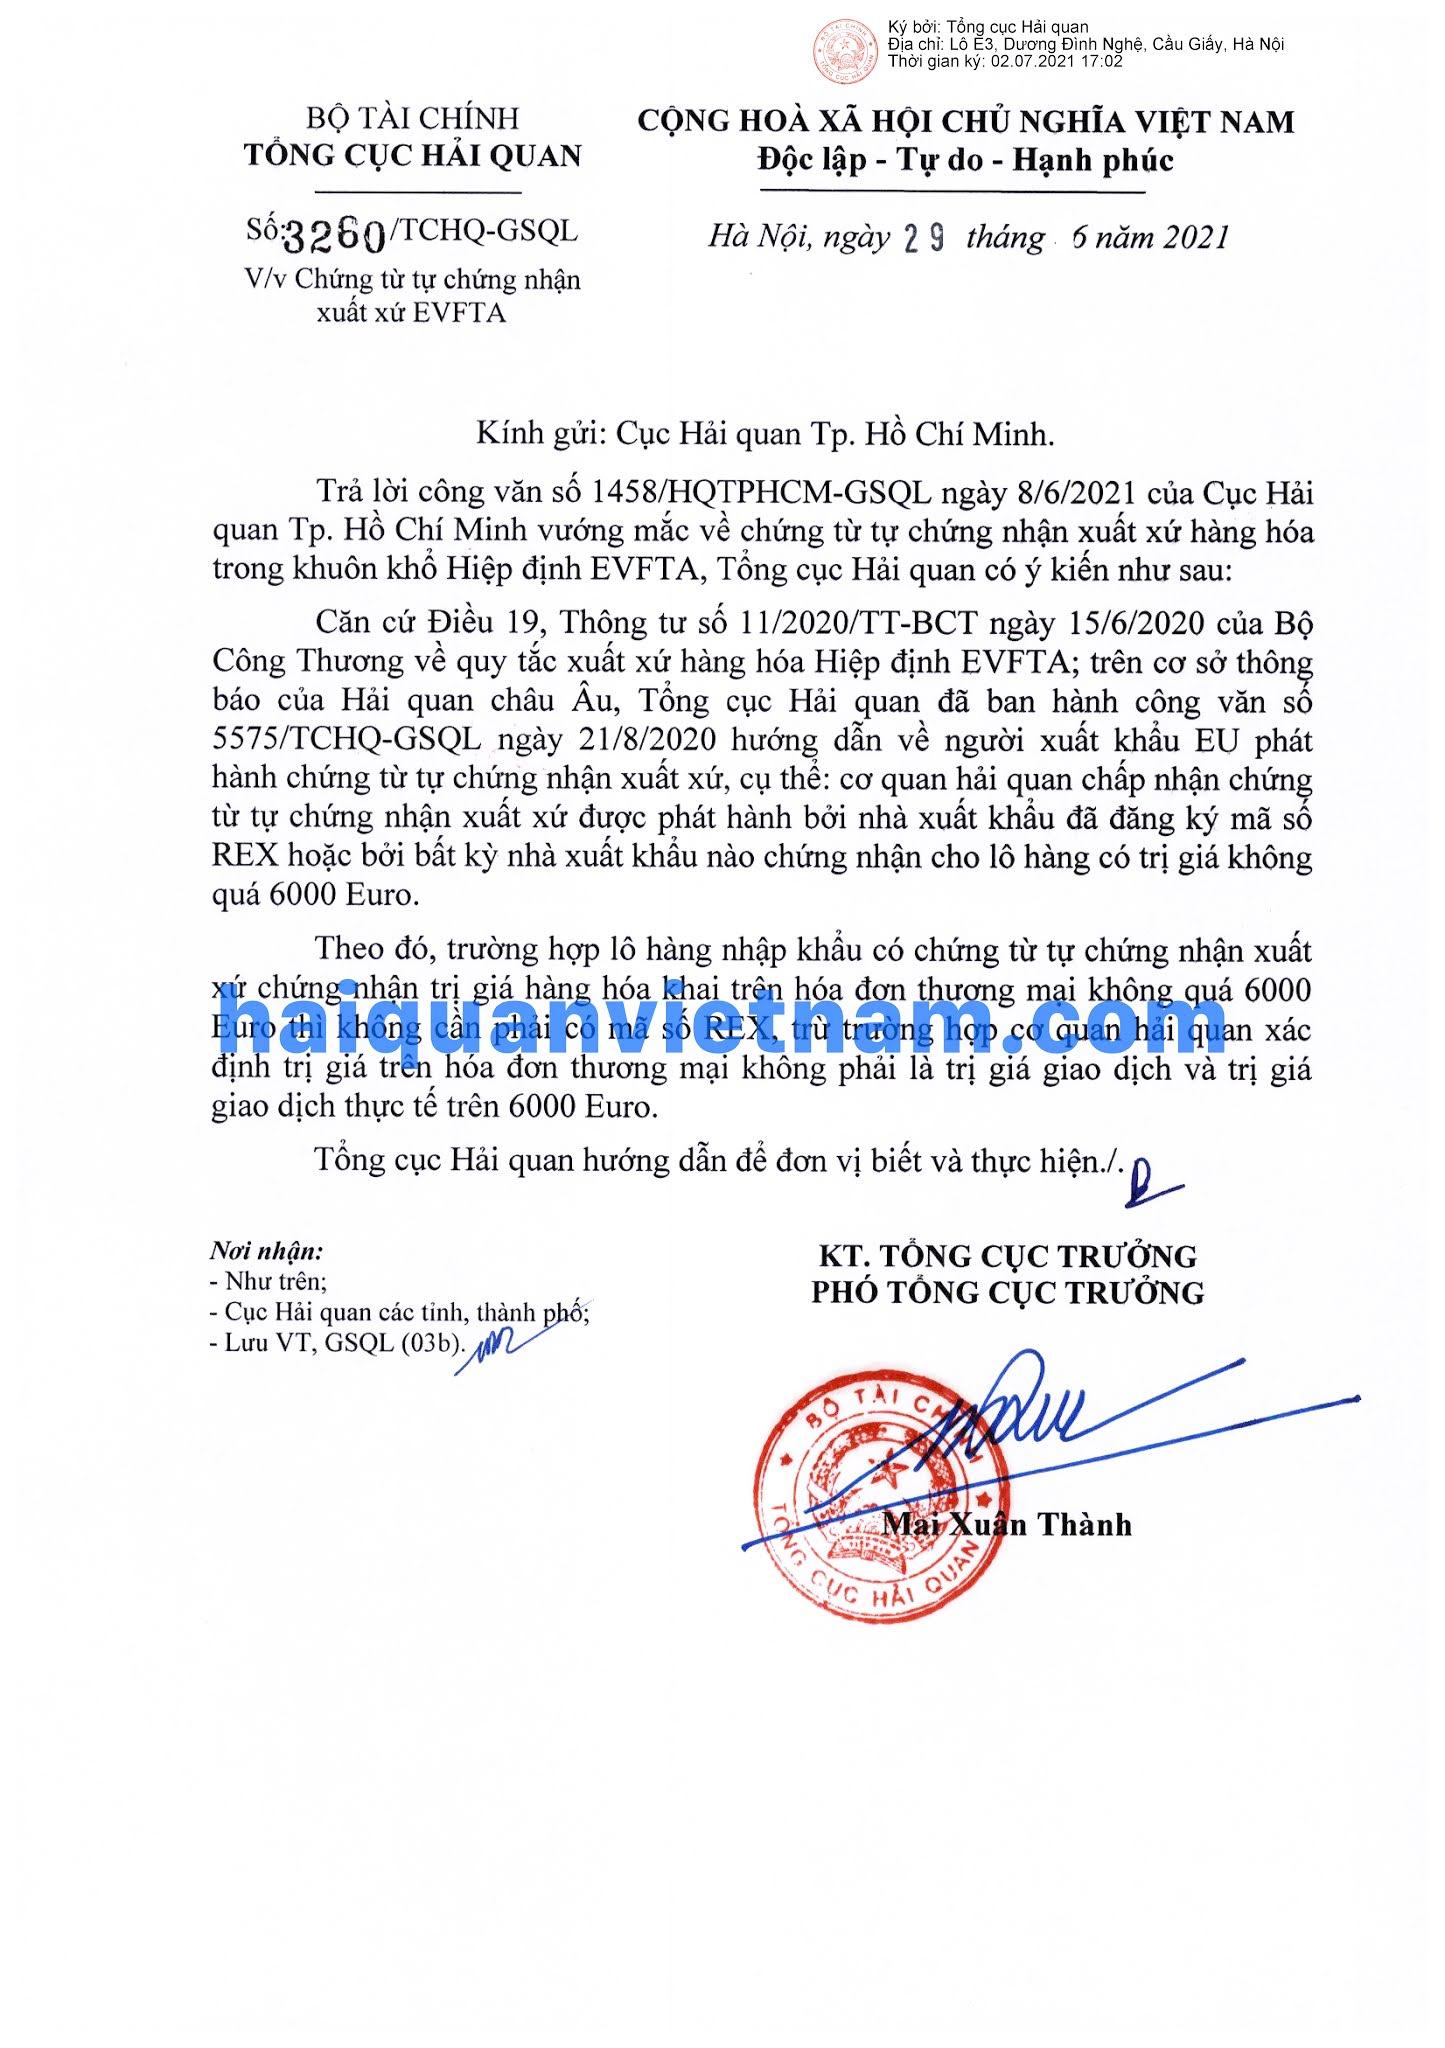 [Image: 210629-3260-TCHQ-GSQL_haiquanvietnam_01.jpg]